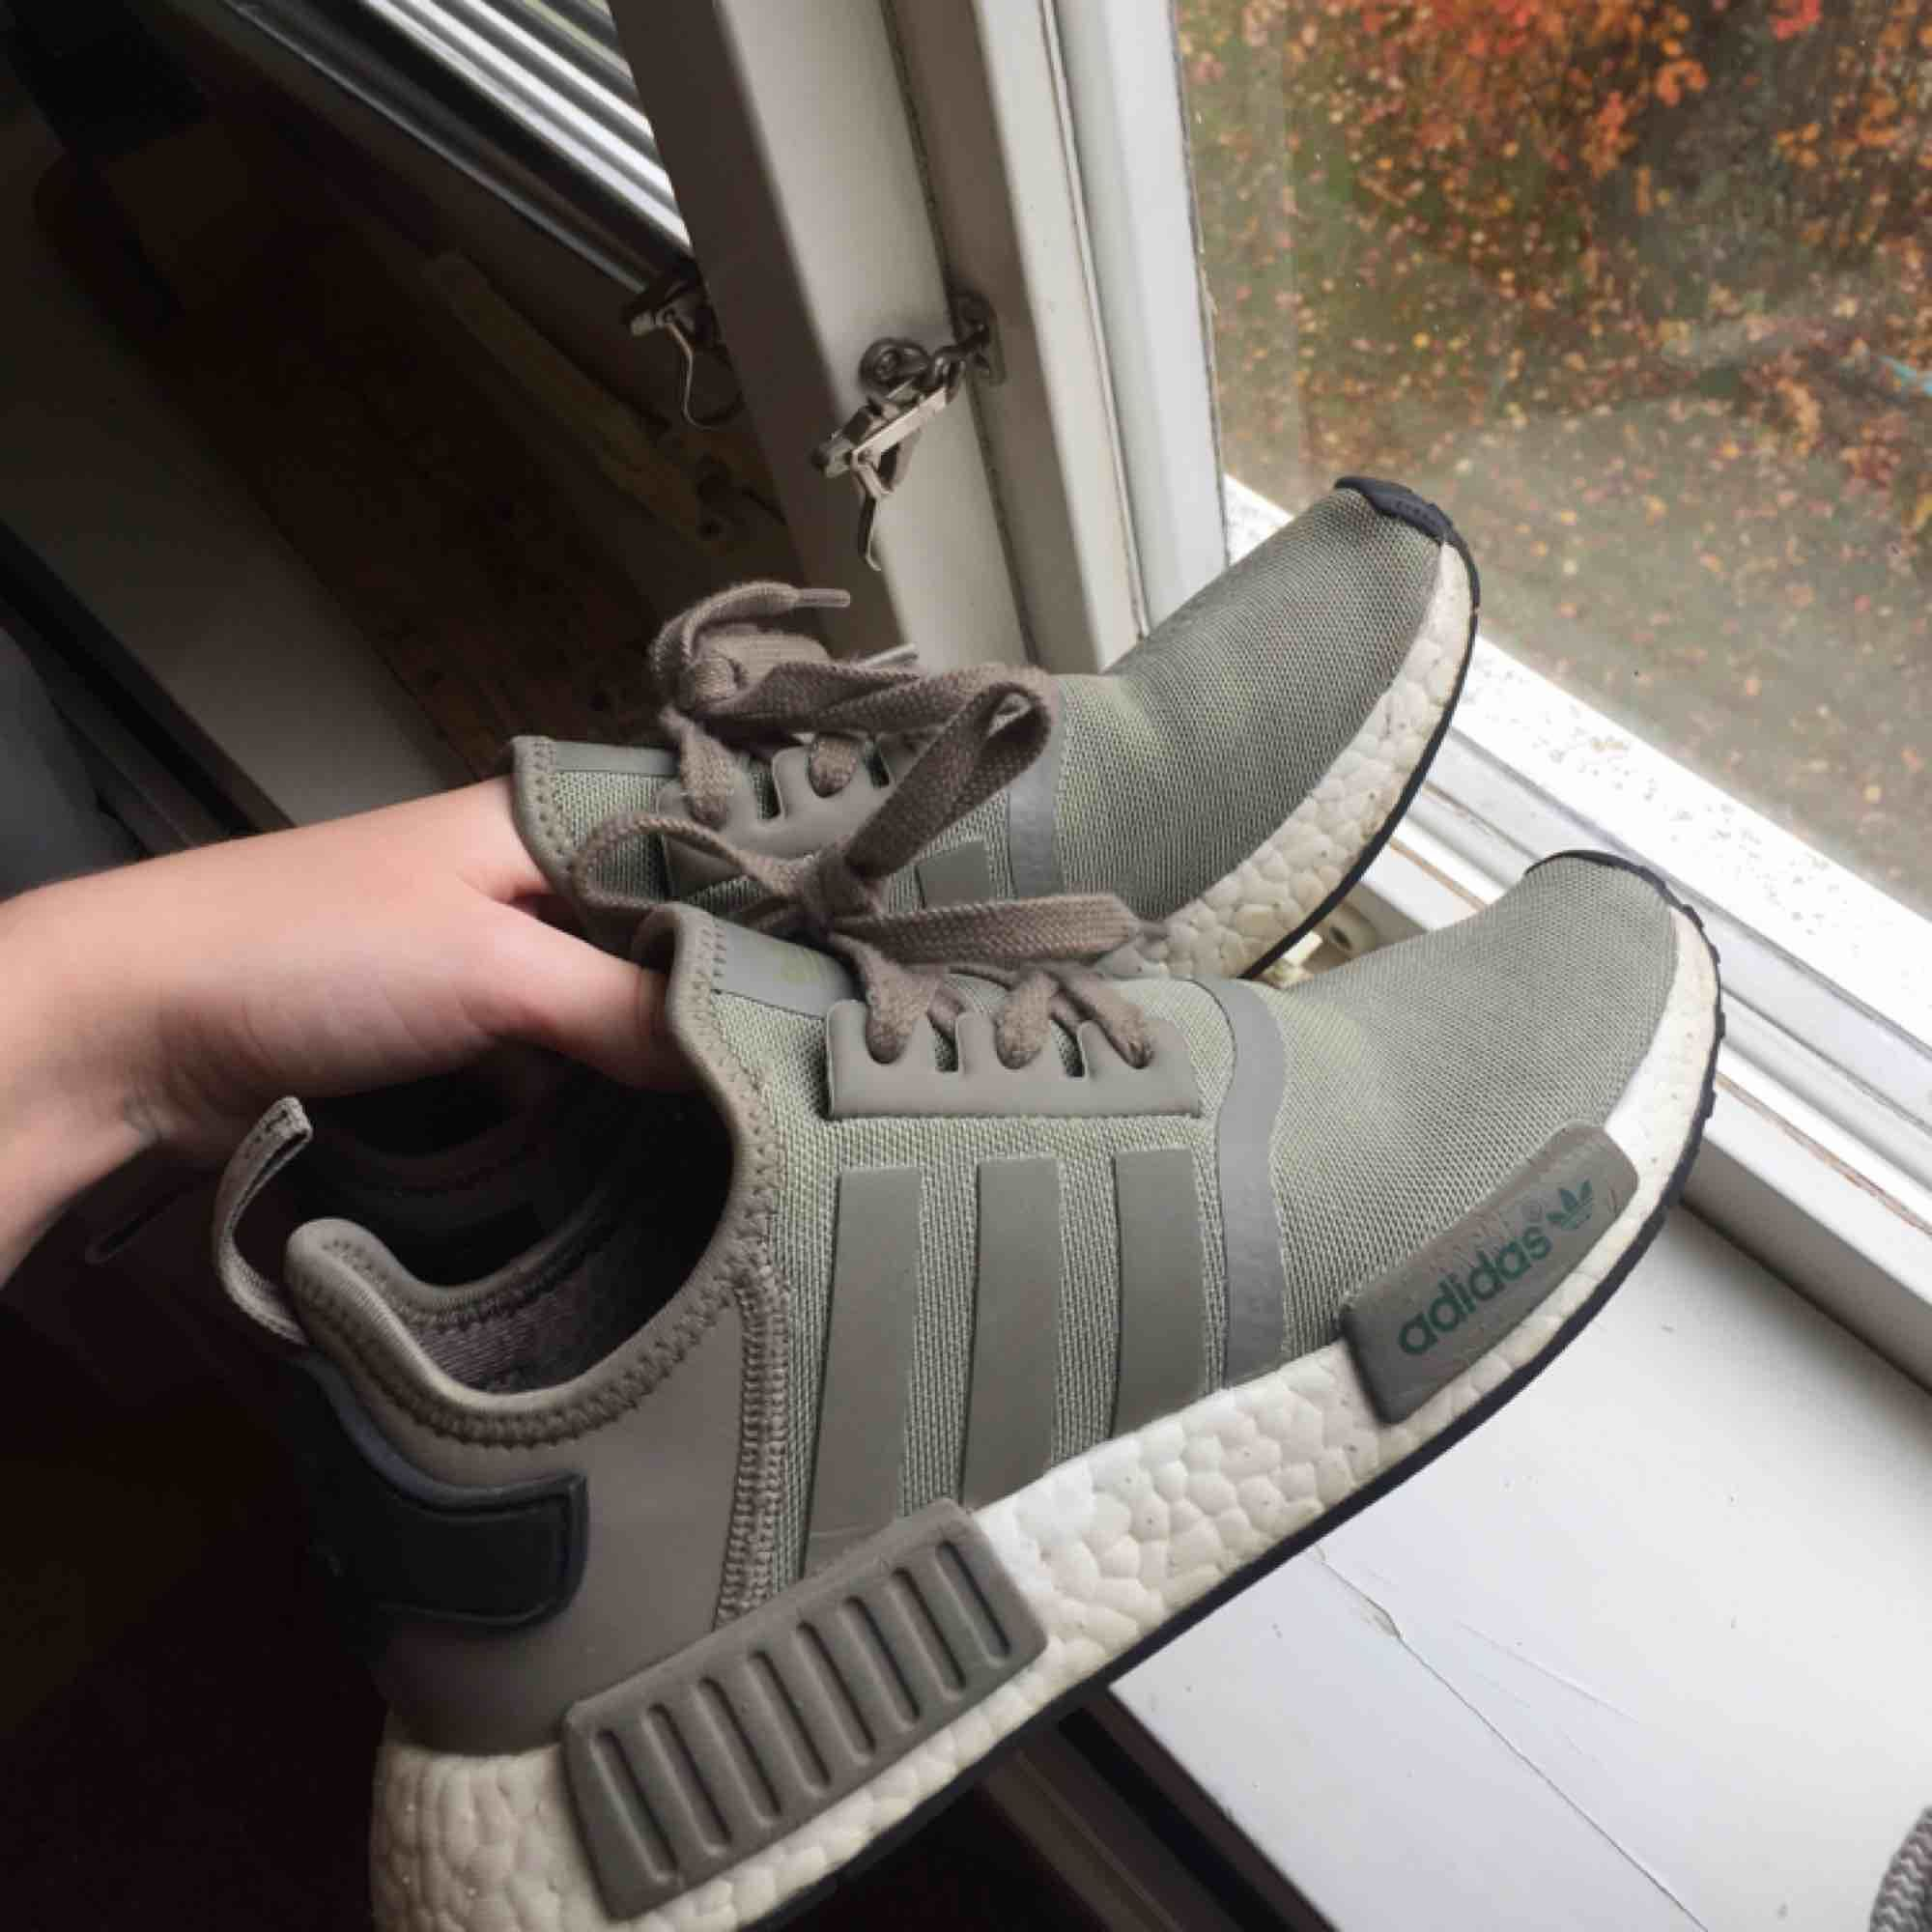 ... Adidas NMD R1 gröna skor. Storlek  38 Bra skick lite slitna (kolla 3de  ... ac059a76230a8